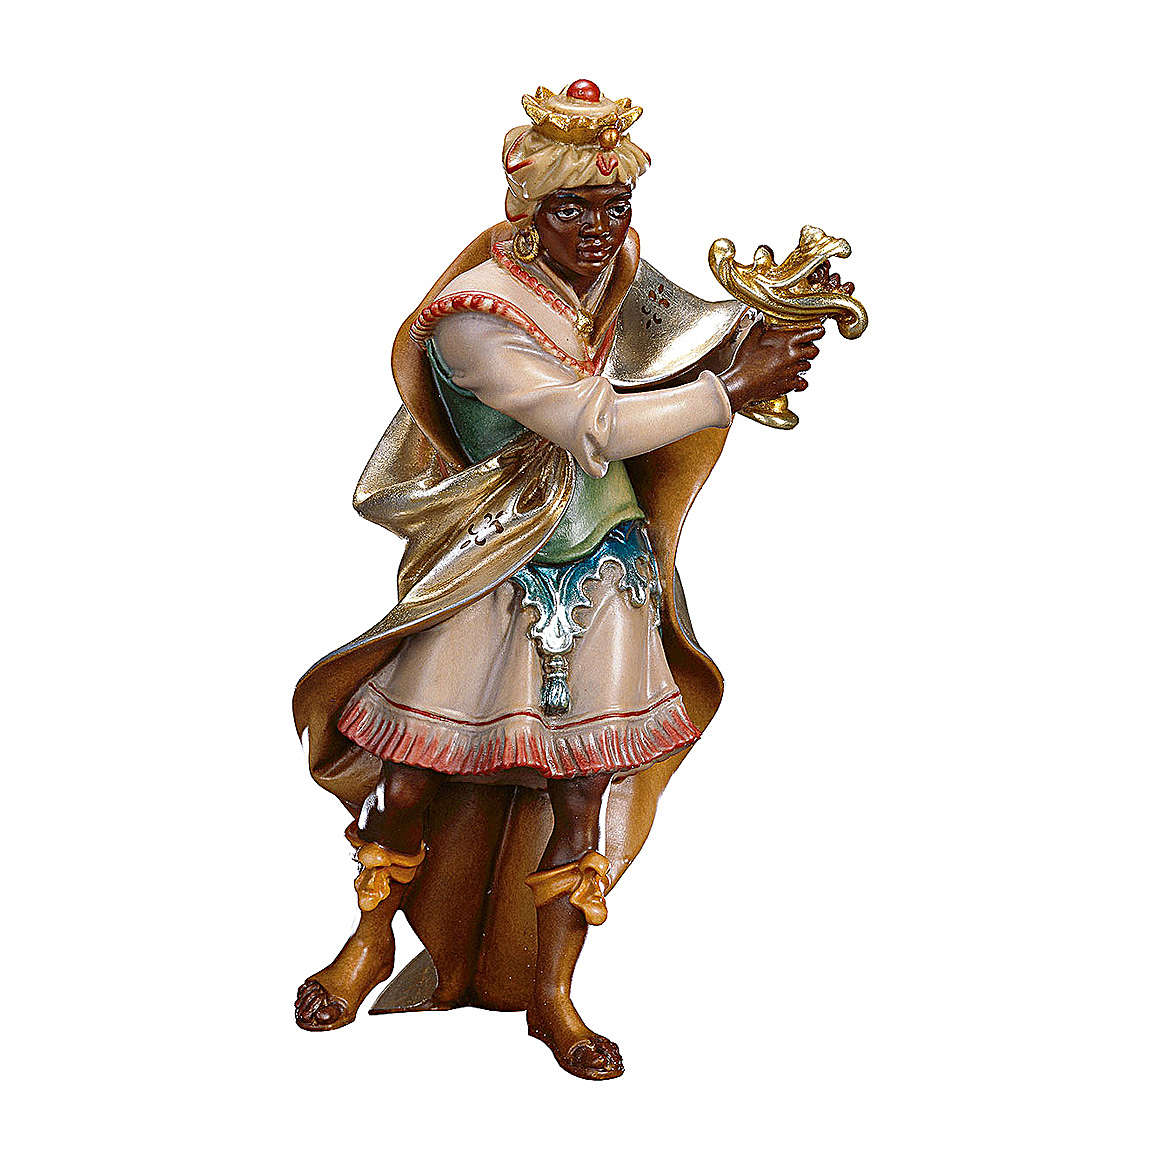 Statuetta Re moro presepe Original legno dipinto Valgardena 10 cm 4